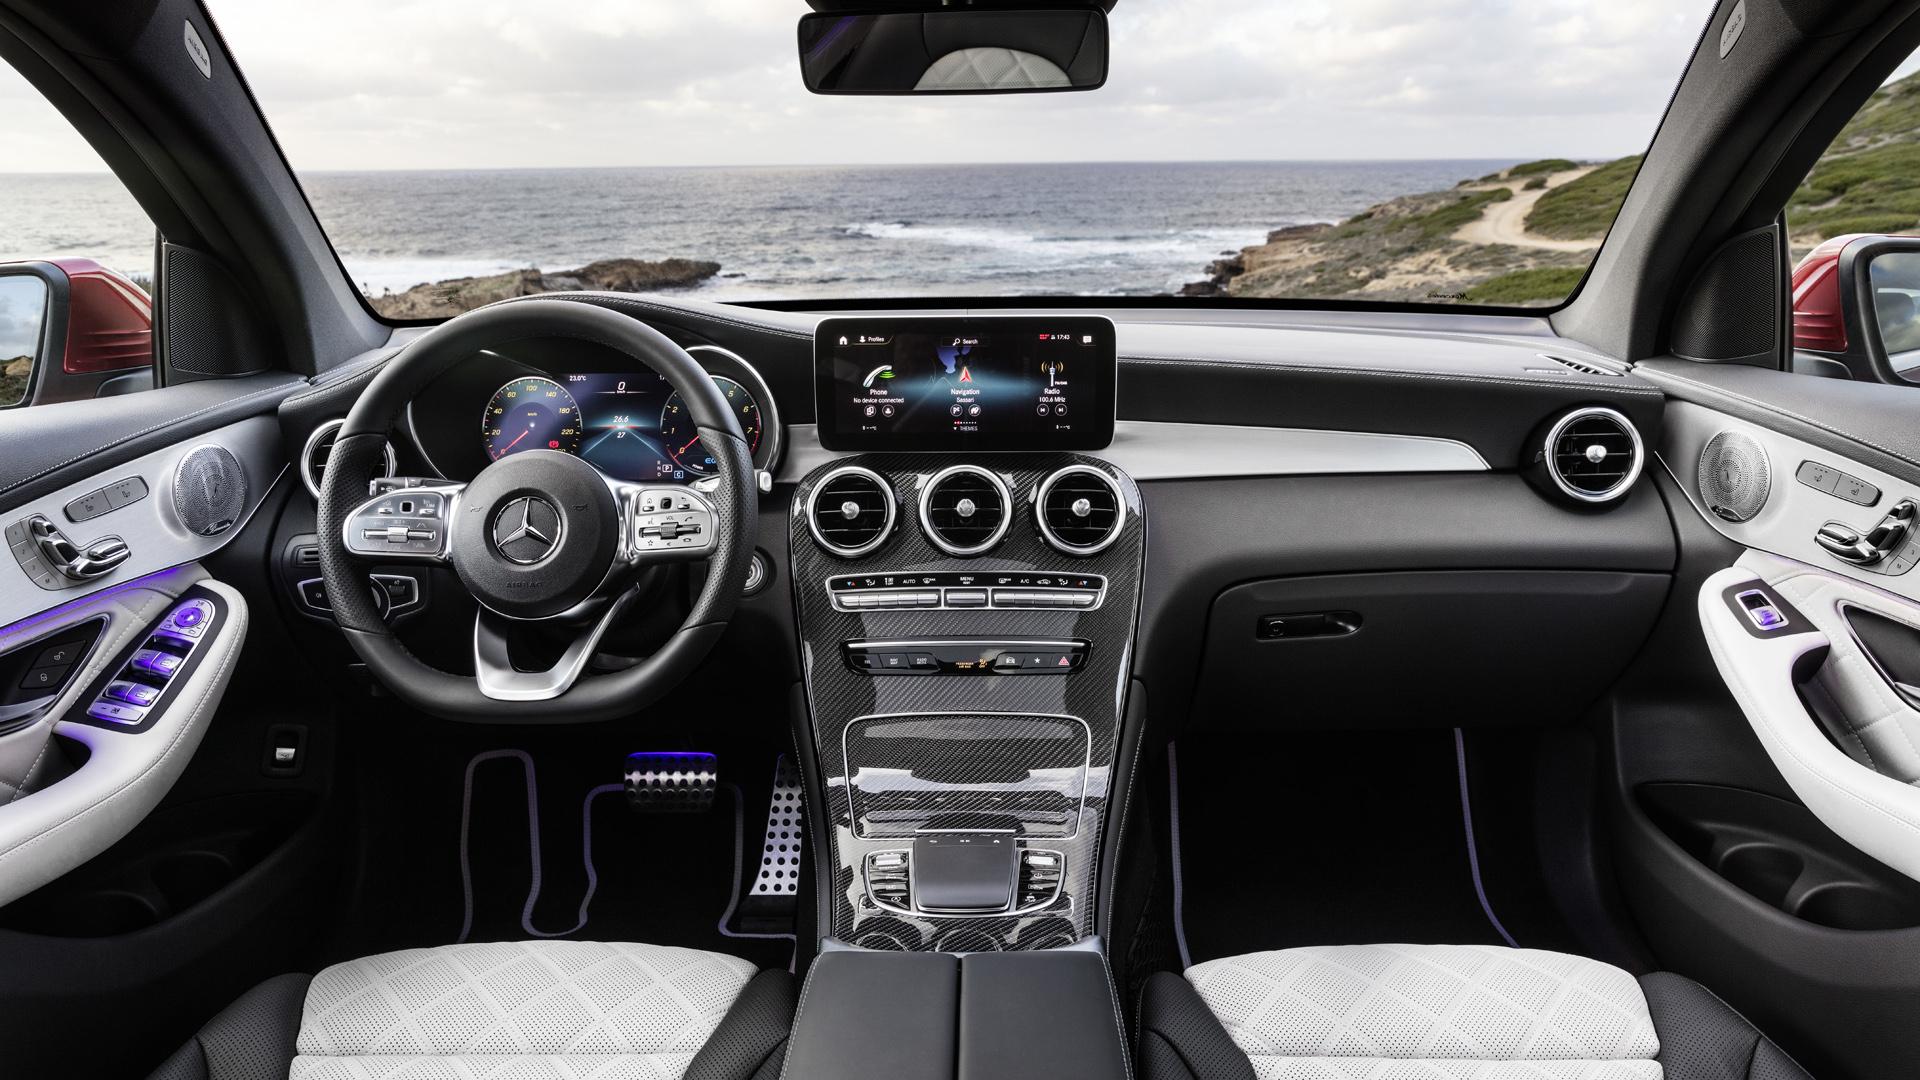 Mercedes-Benz GLC Coupe 2020